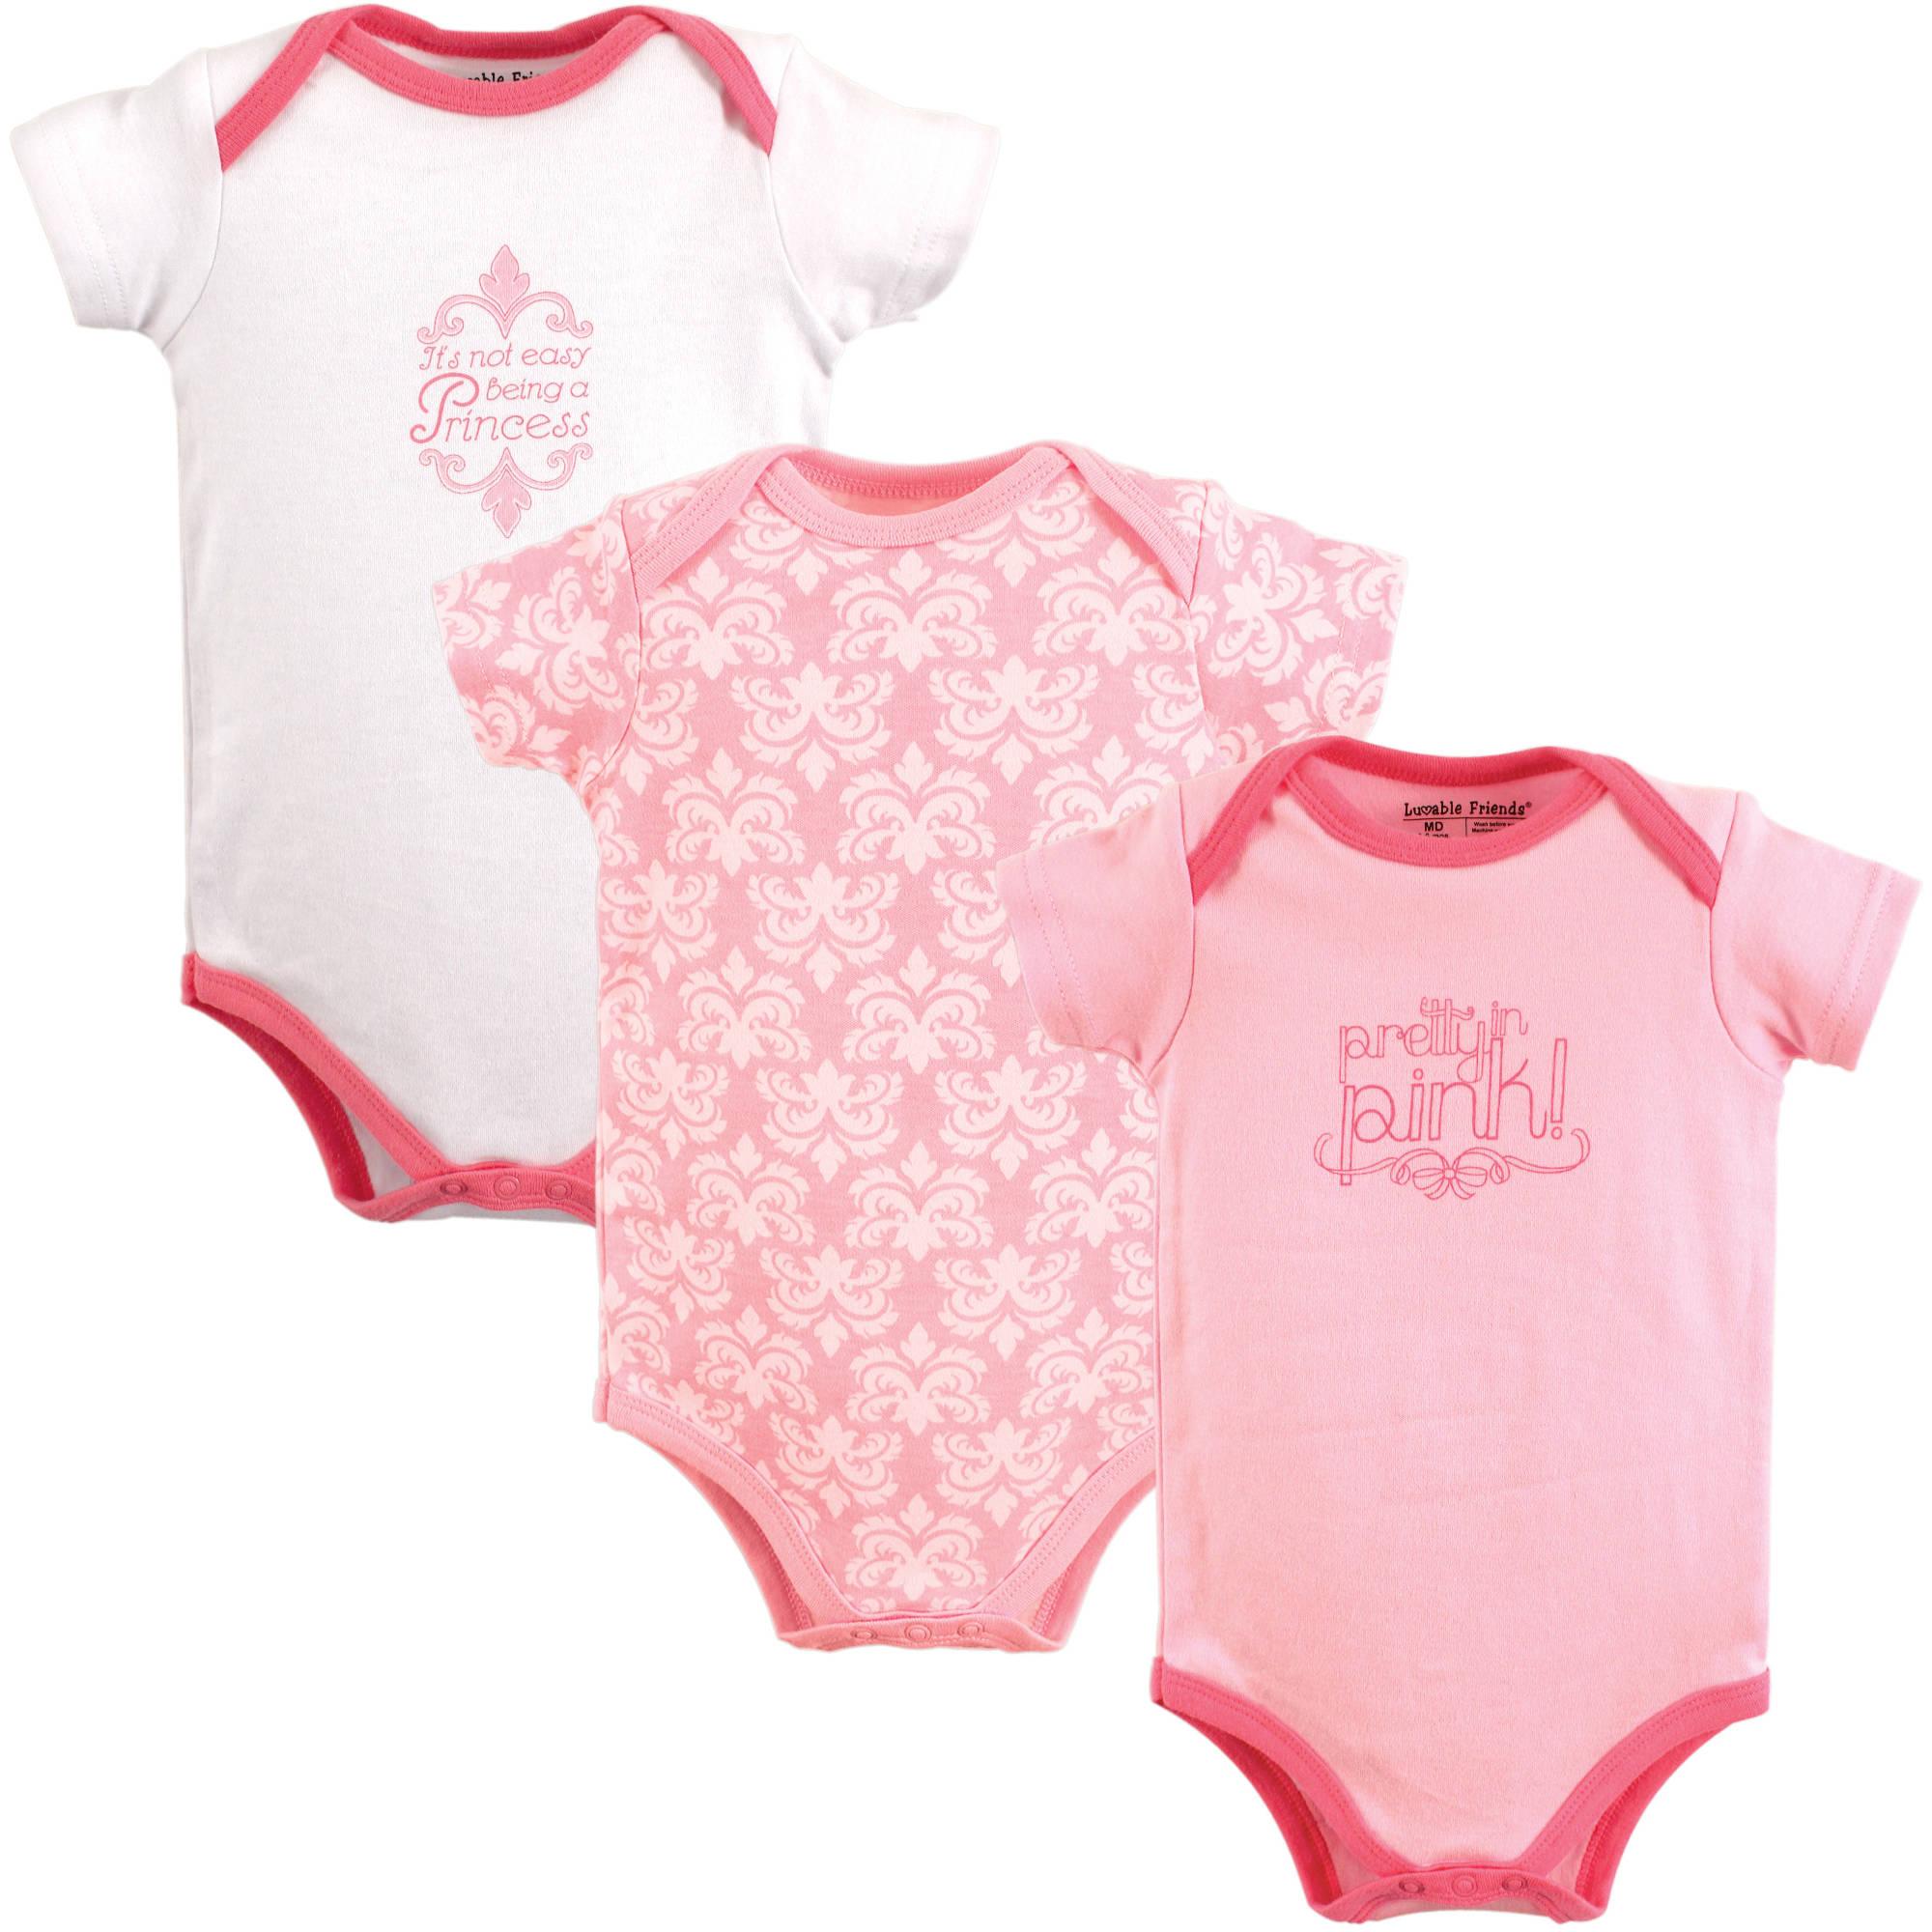 Luvable Friends Newborn Baby Girls Bodysuit 3 Pack